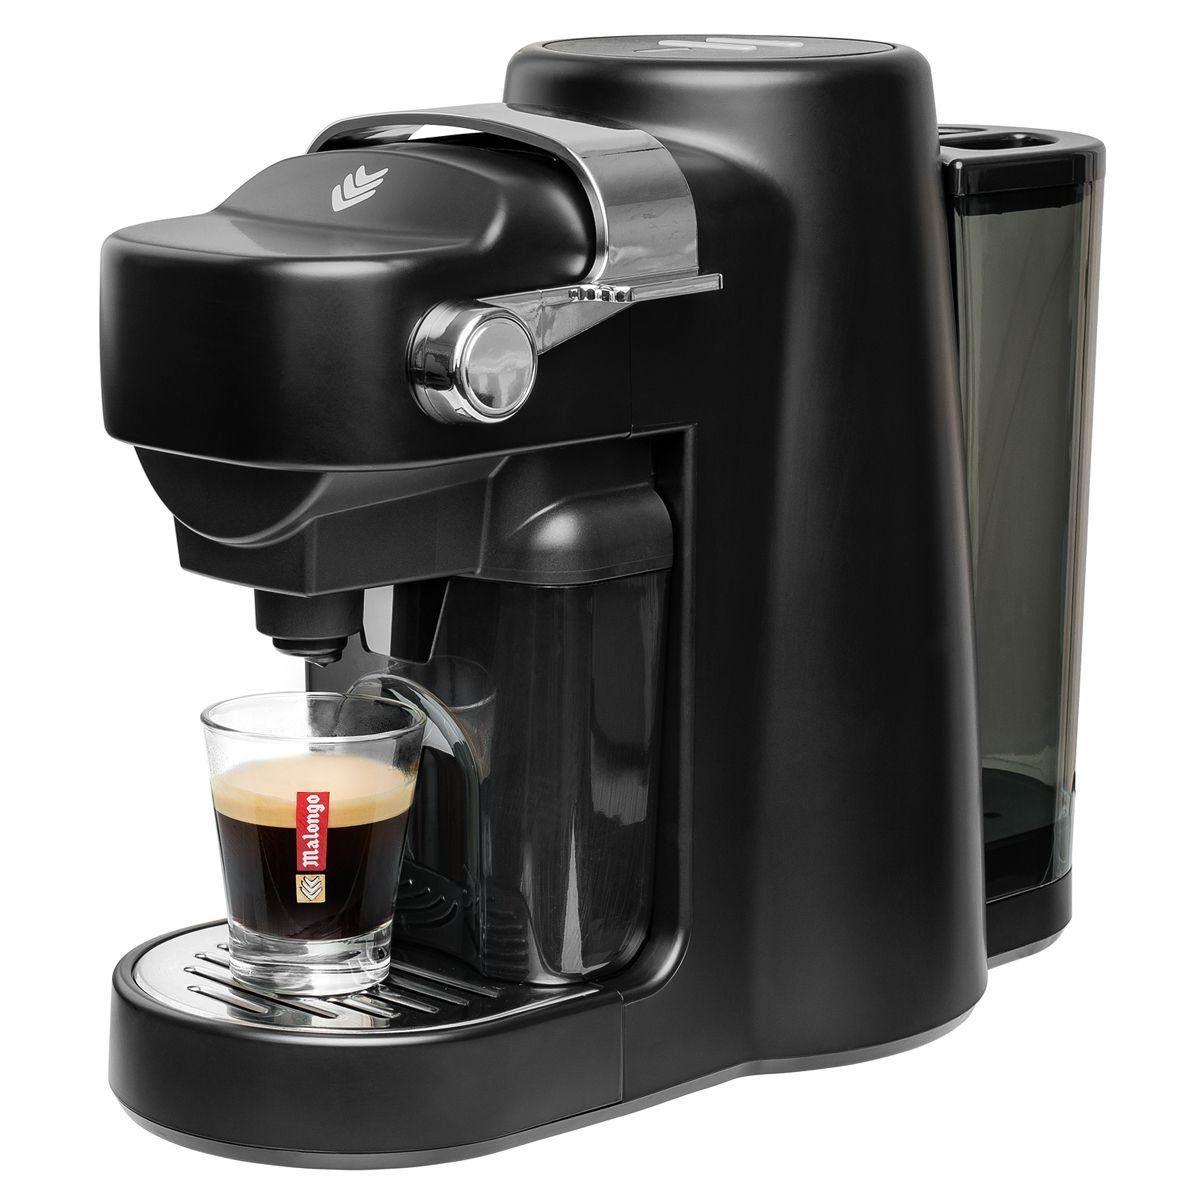 Machine Expresso Malongo 16 Bars Machine A Expresso Expresso Espresso Machine Machine